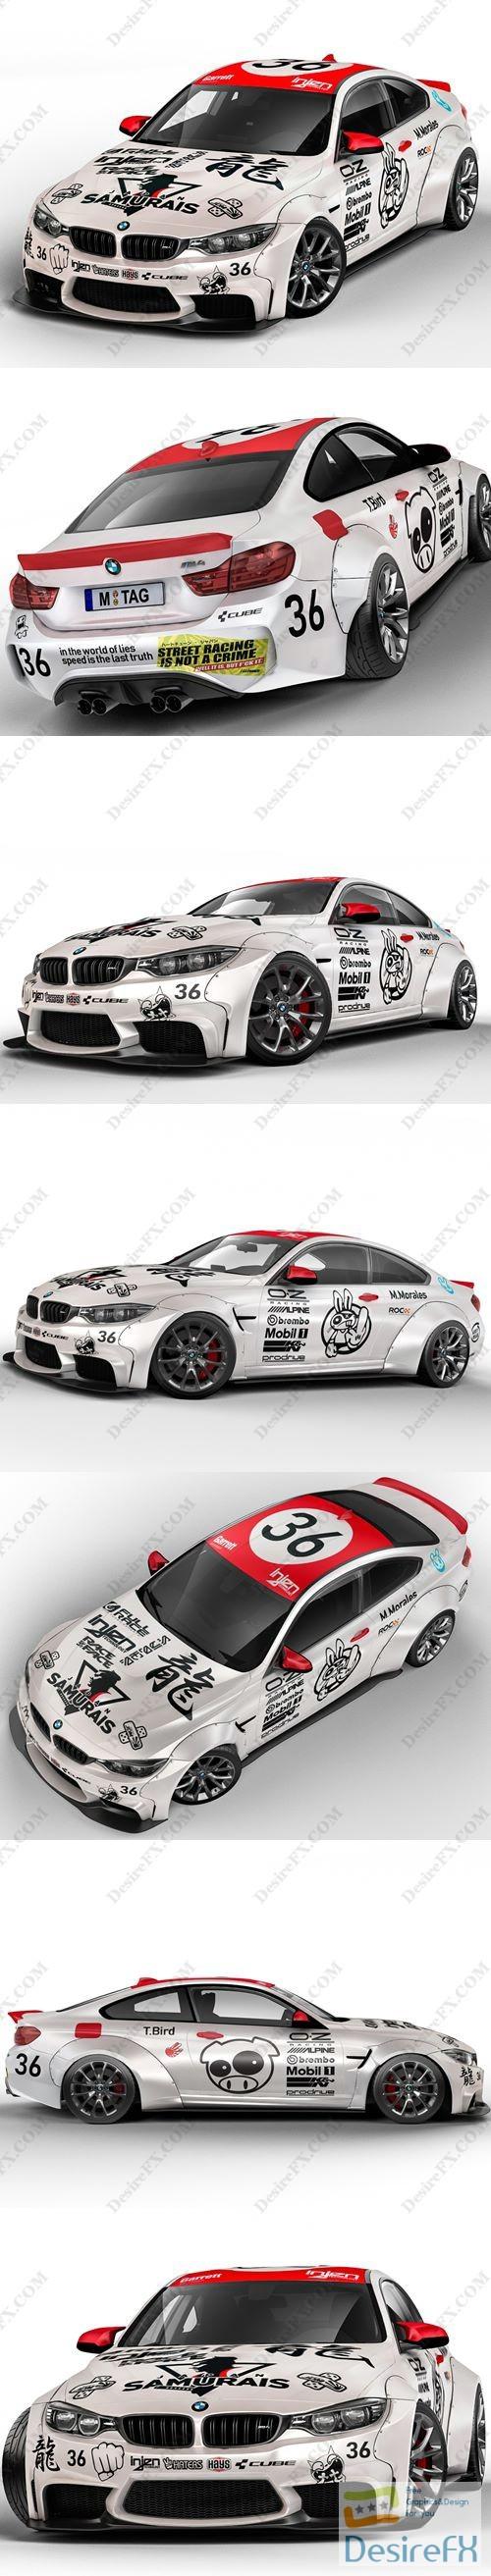 3d-models - BMW M4 Street Race Edition 3D Model